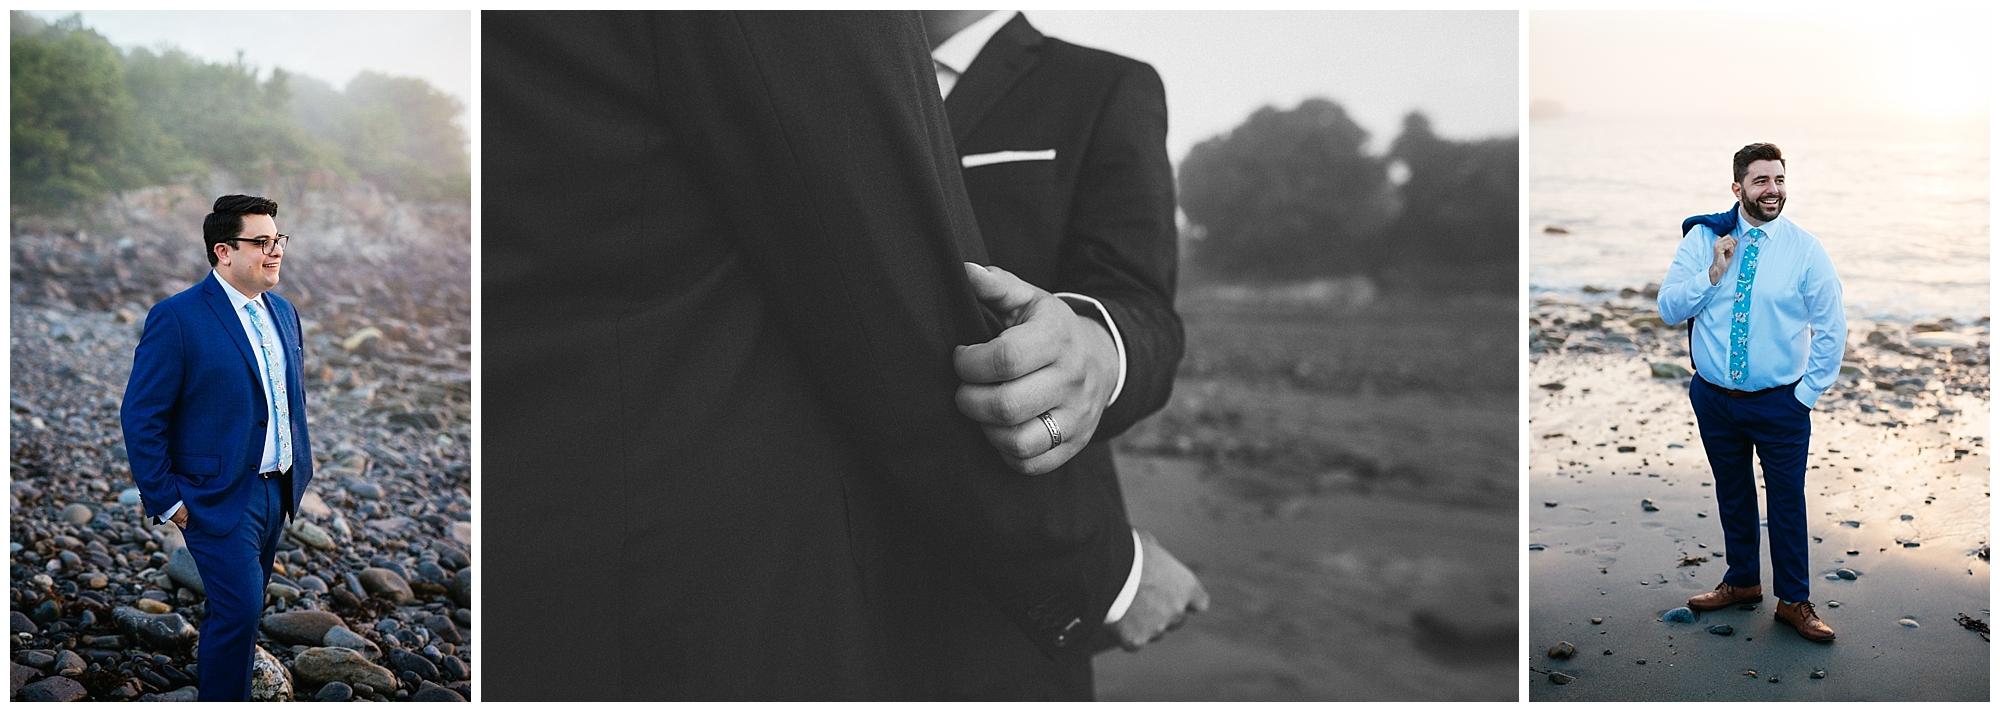 Portland-Wedding-Photographer_0044.jpg